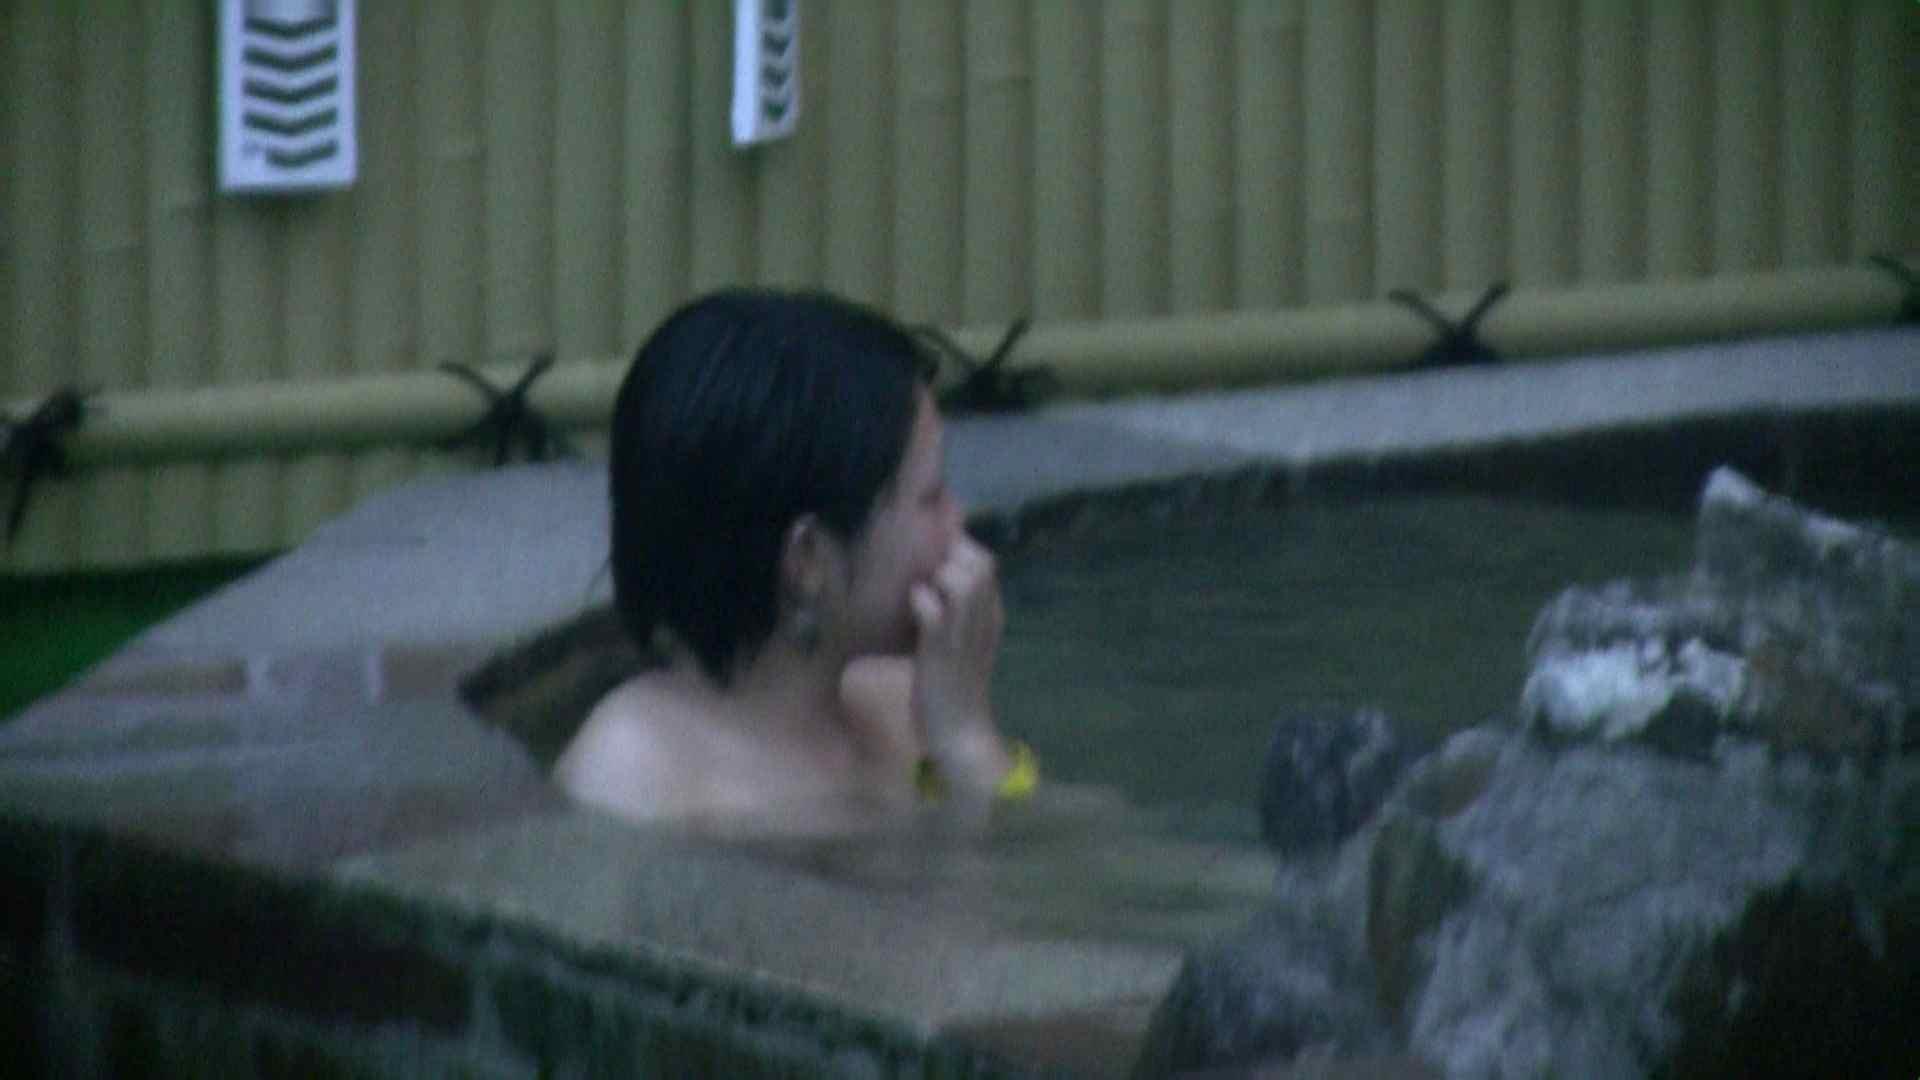 Aquaな露天風呂Vol.05【VIP】 露天風呂編  112PIX 14